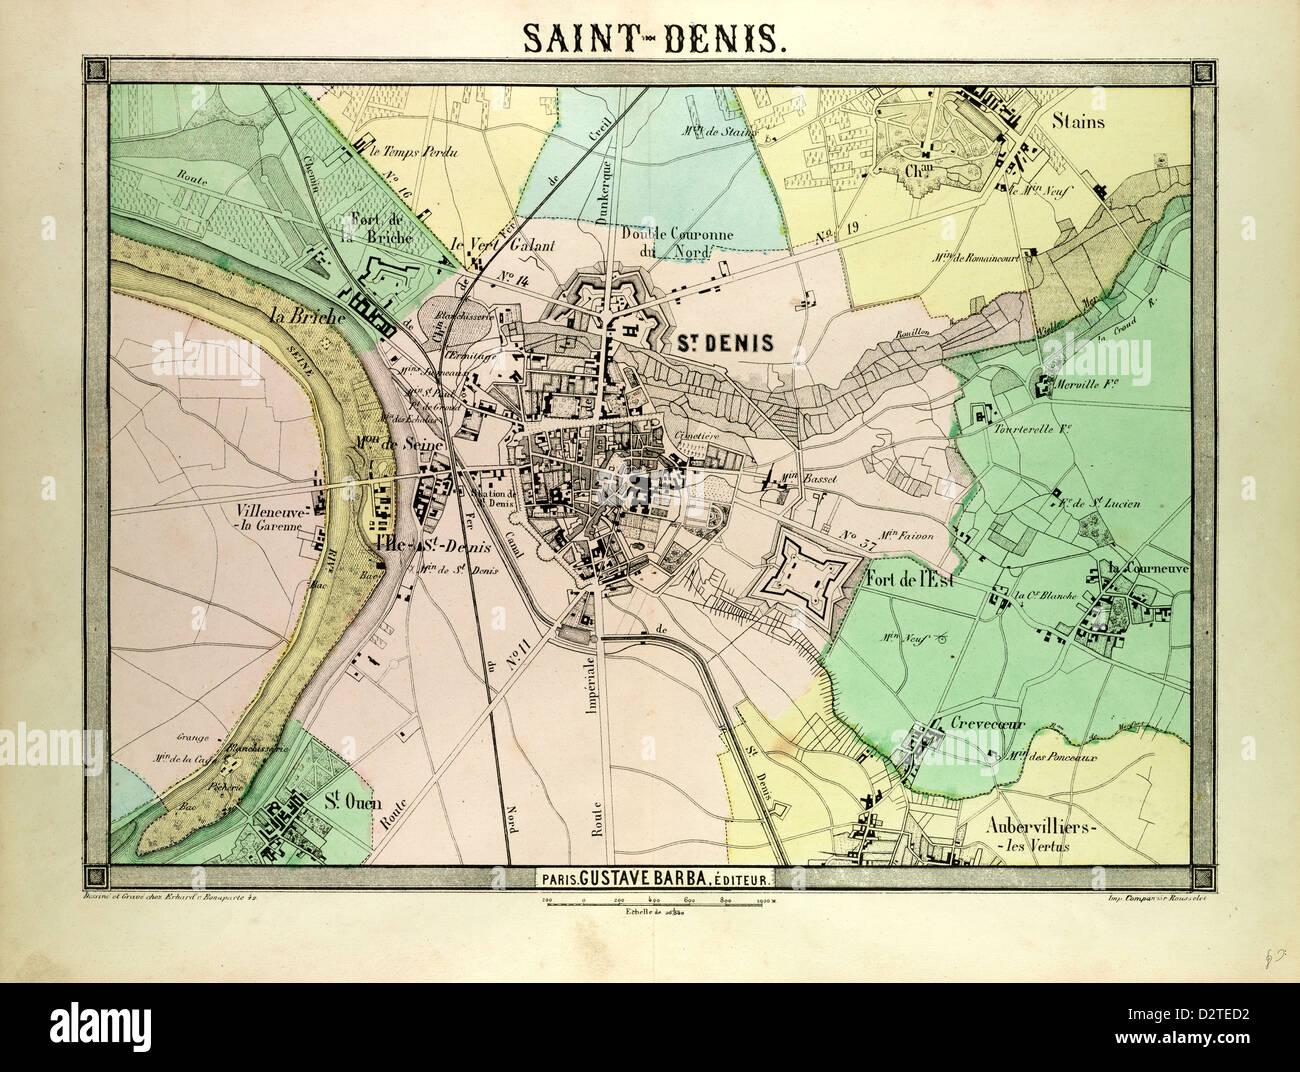 Saint Denis France Map.Map Of Saint Denis France Stock Photo 53398606 Alamy